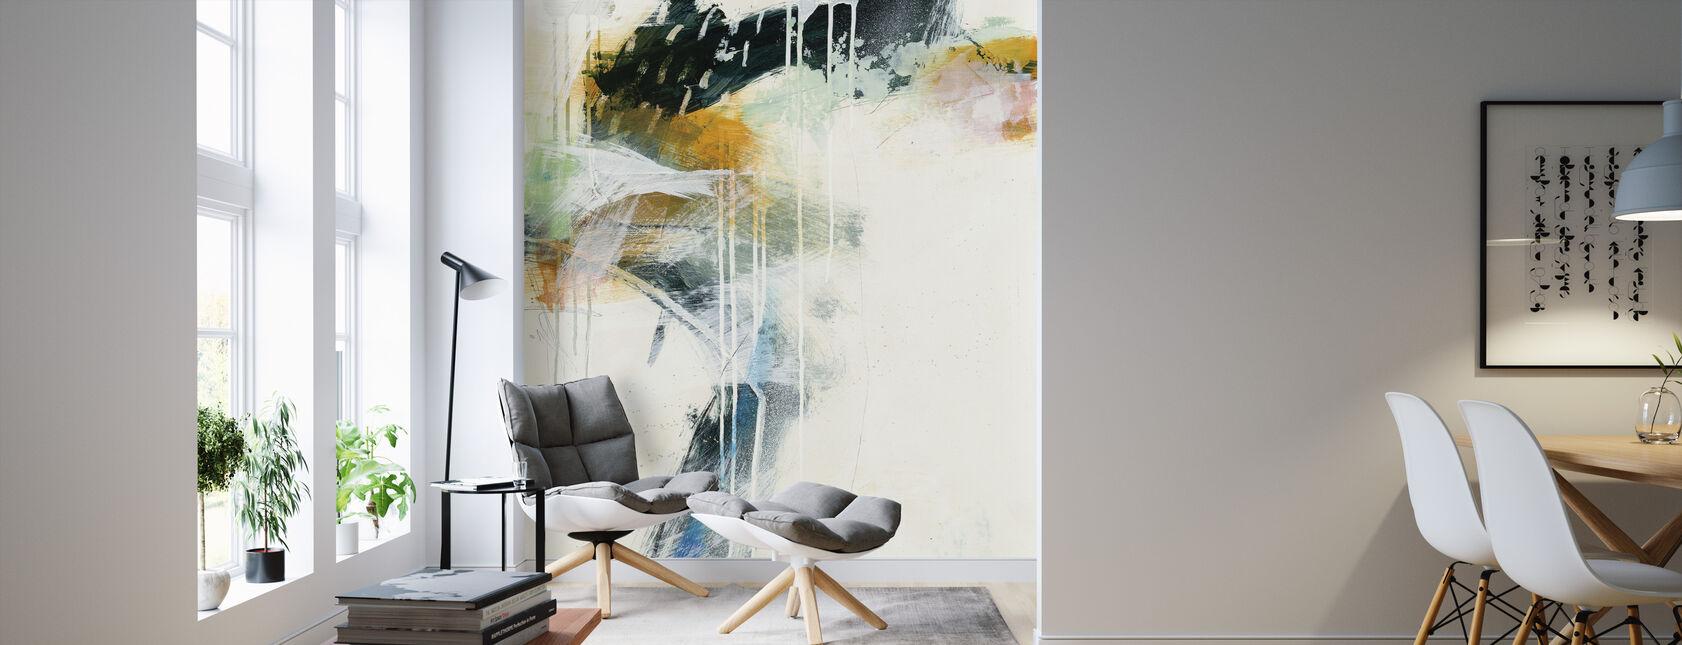 Turbulence II - Wallpaper - Living Room